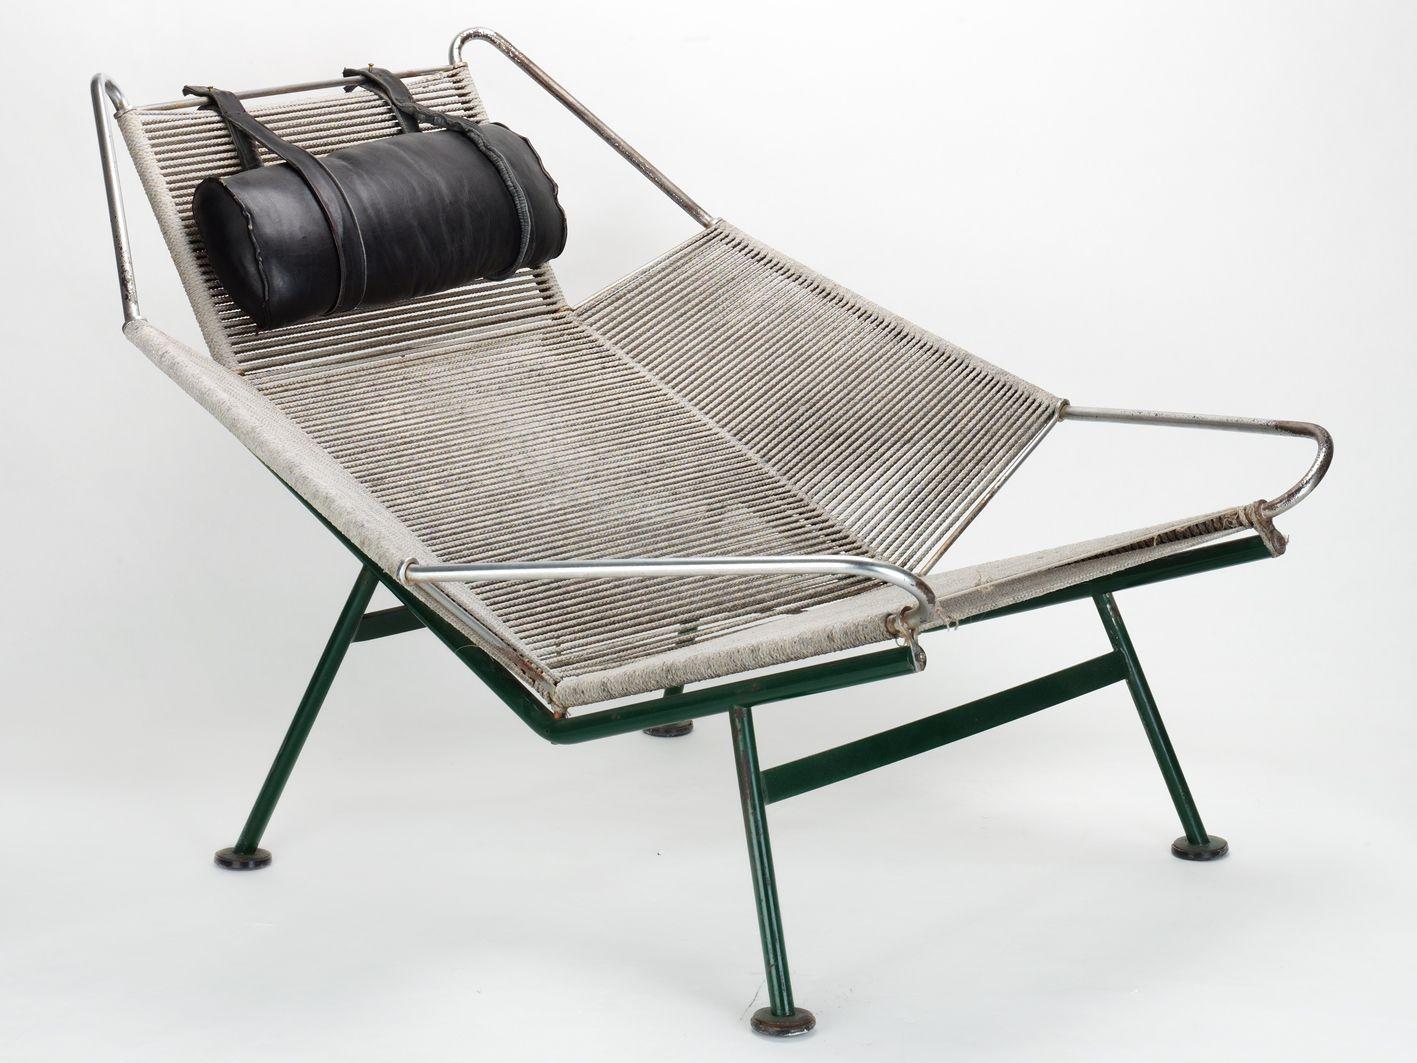 Sammlung Loffler Sammlung Loffler Gmbh My Furniture Modern Easy Chair Chair